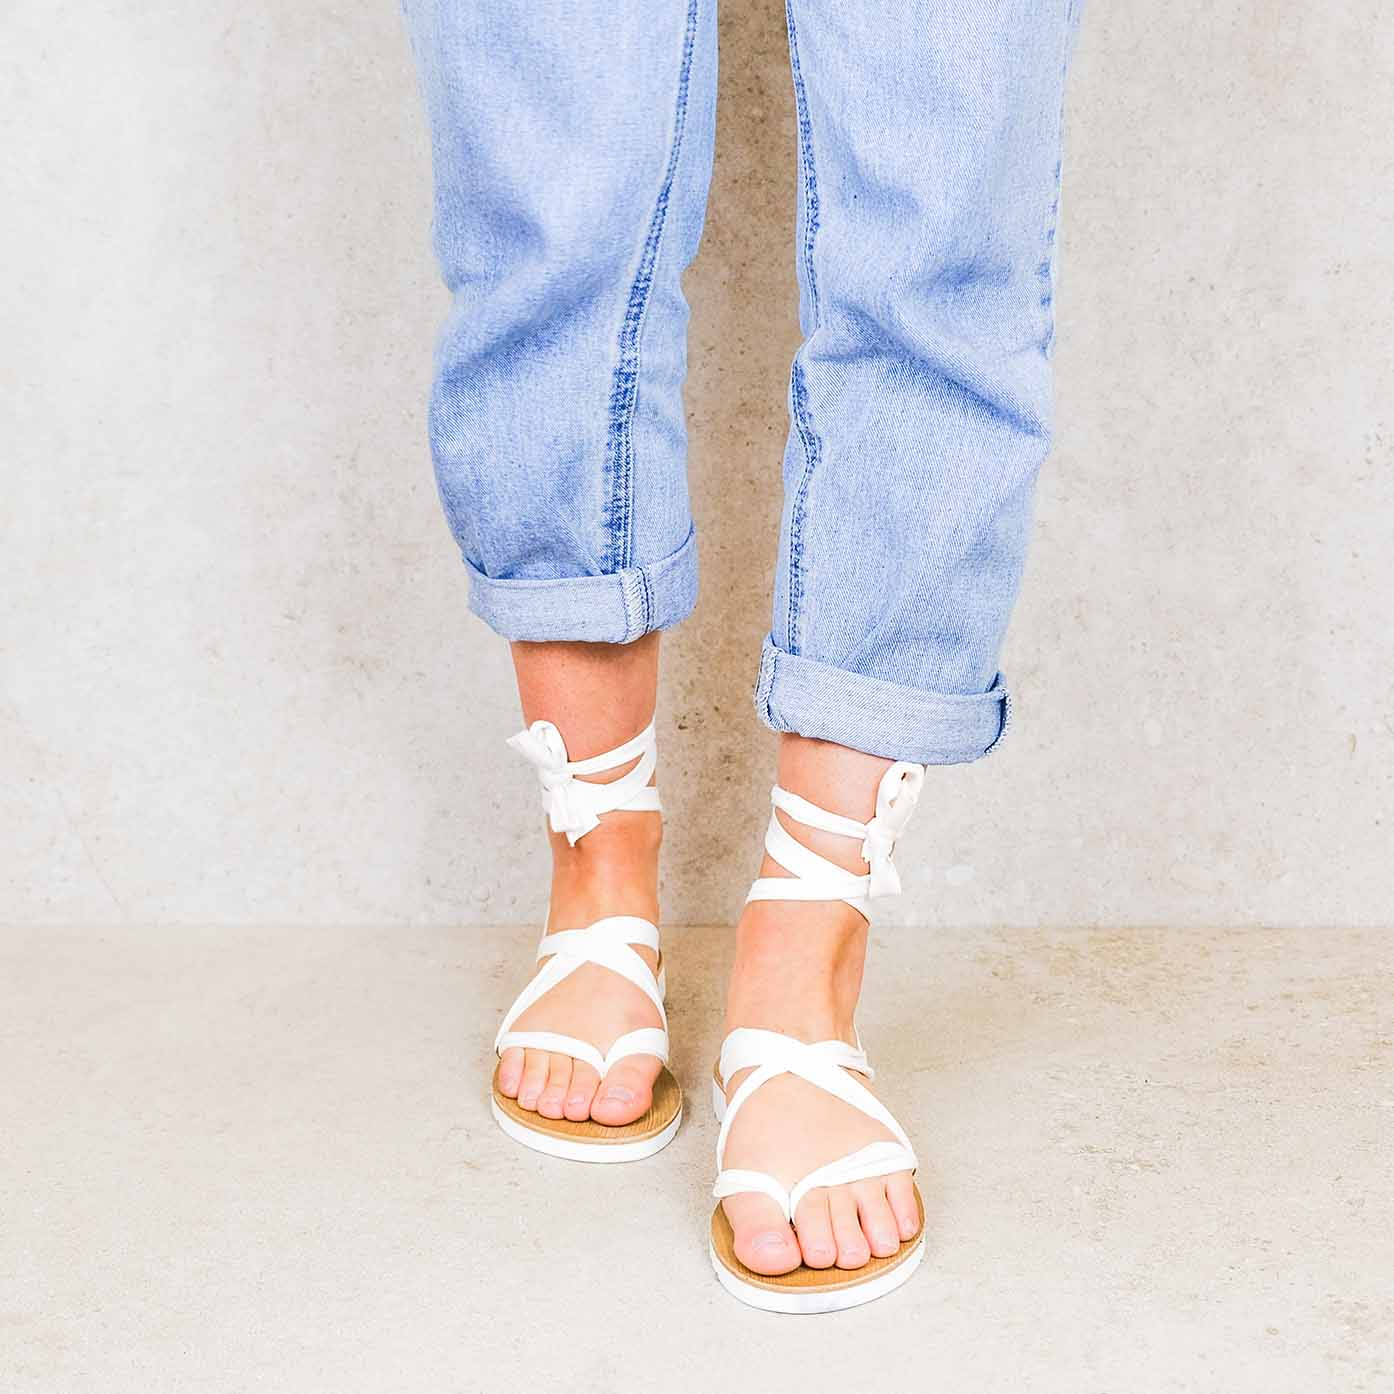 Snow-white_suede ribbons linten lintsandalen sandals travelsandals vegan sustainable sandals wikkelsandalen